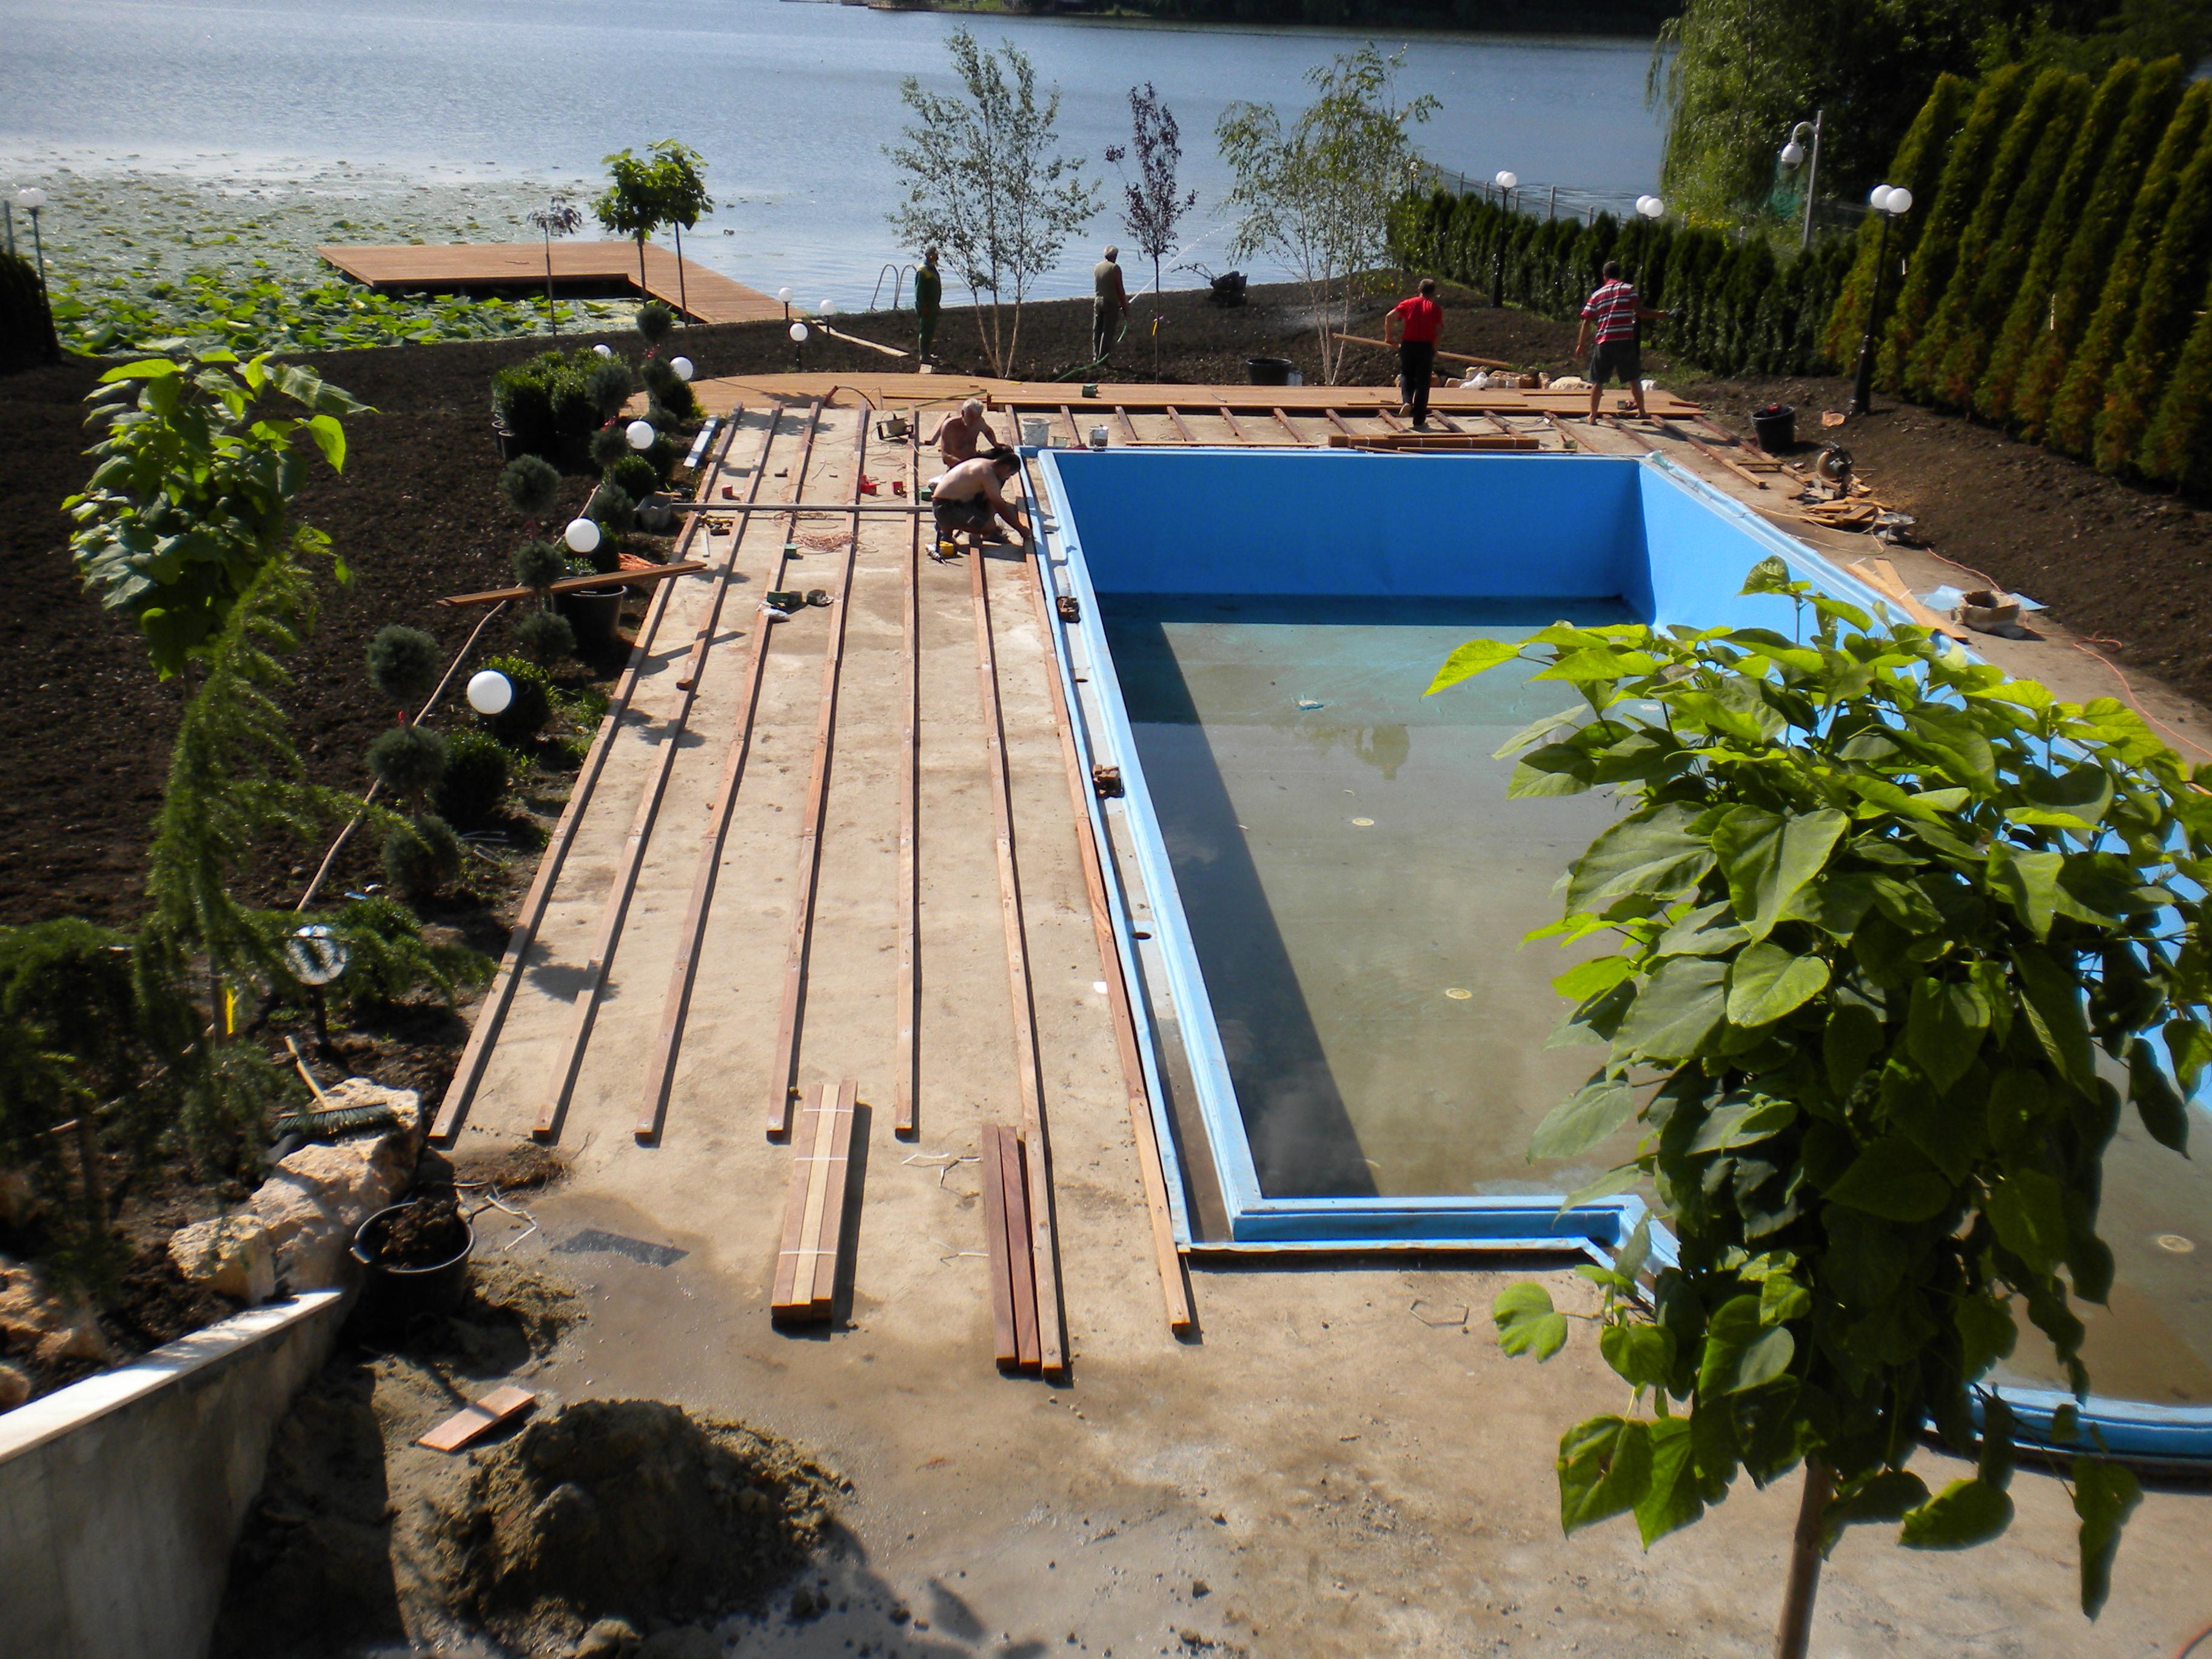 Deck-uri lemn - Angelim Pedra SELVA FLOORS - Poza 24